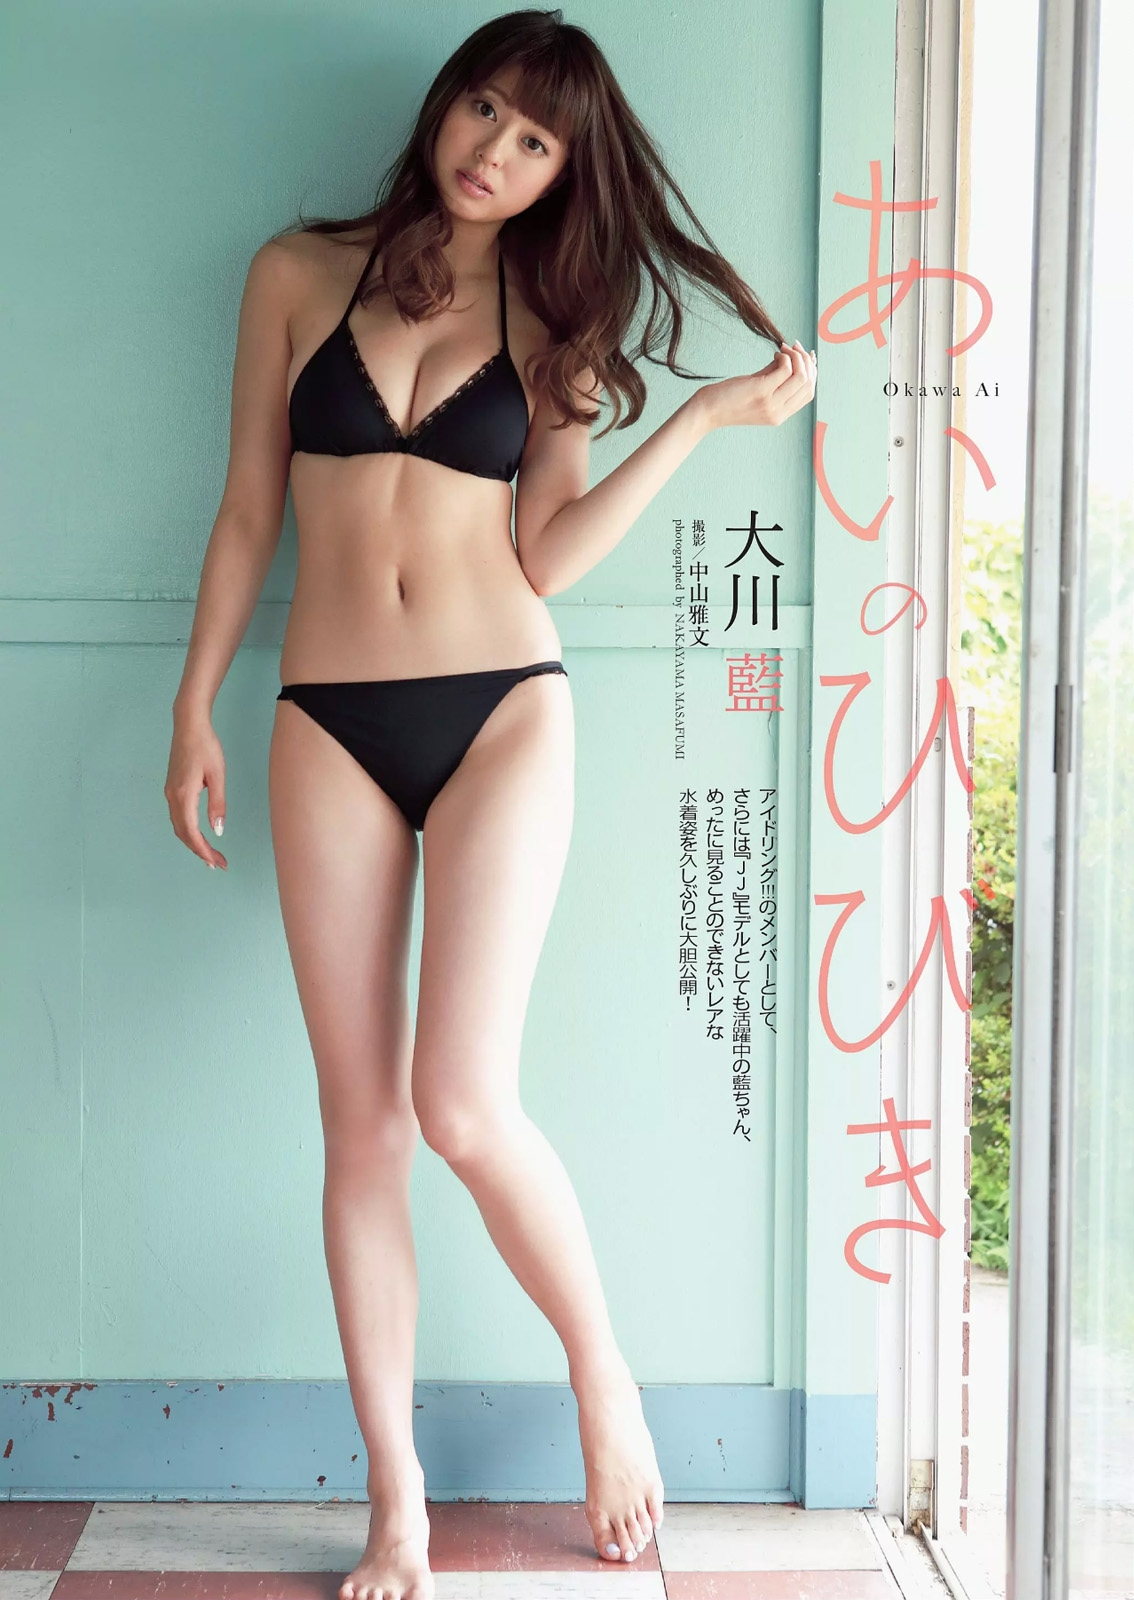 ookawa_ai218.jpg